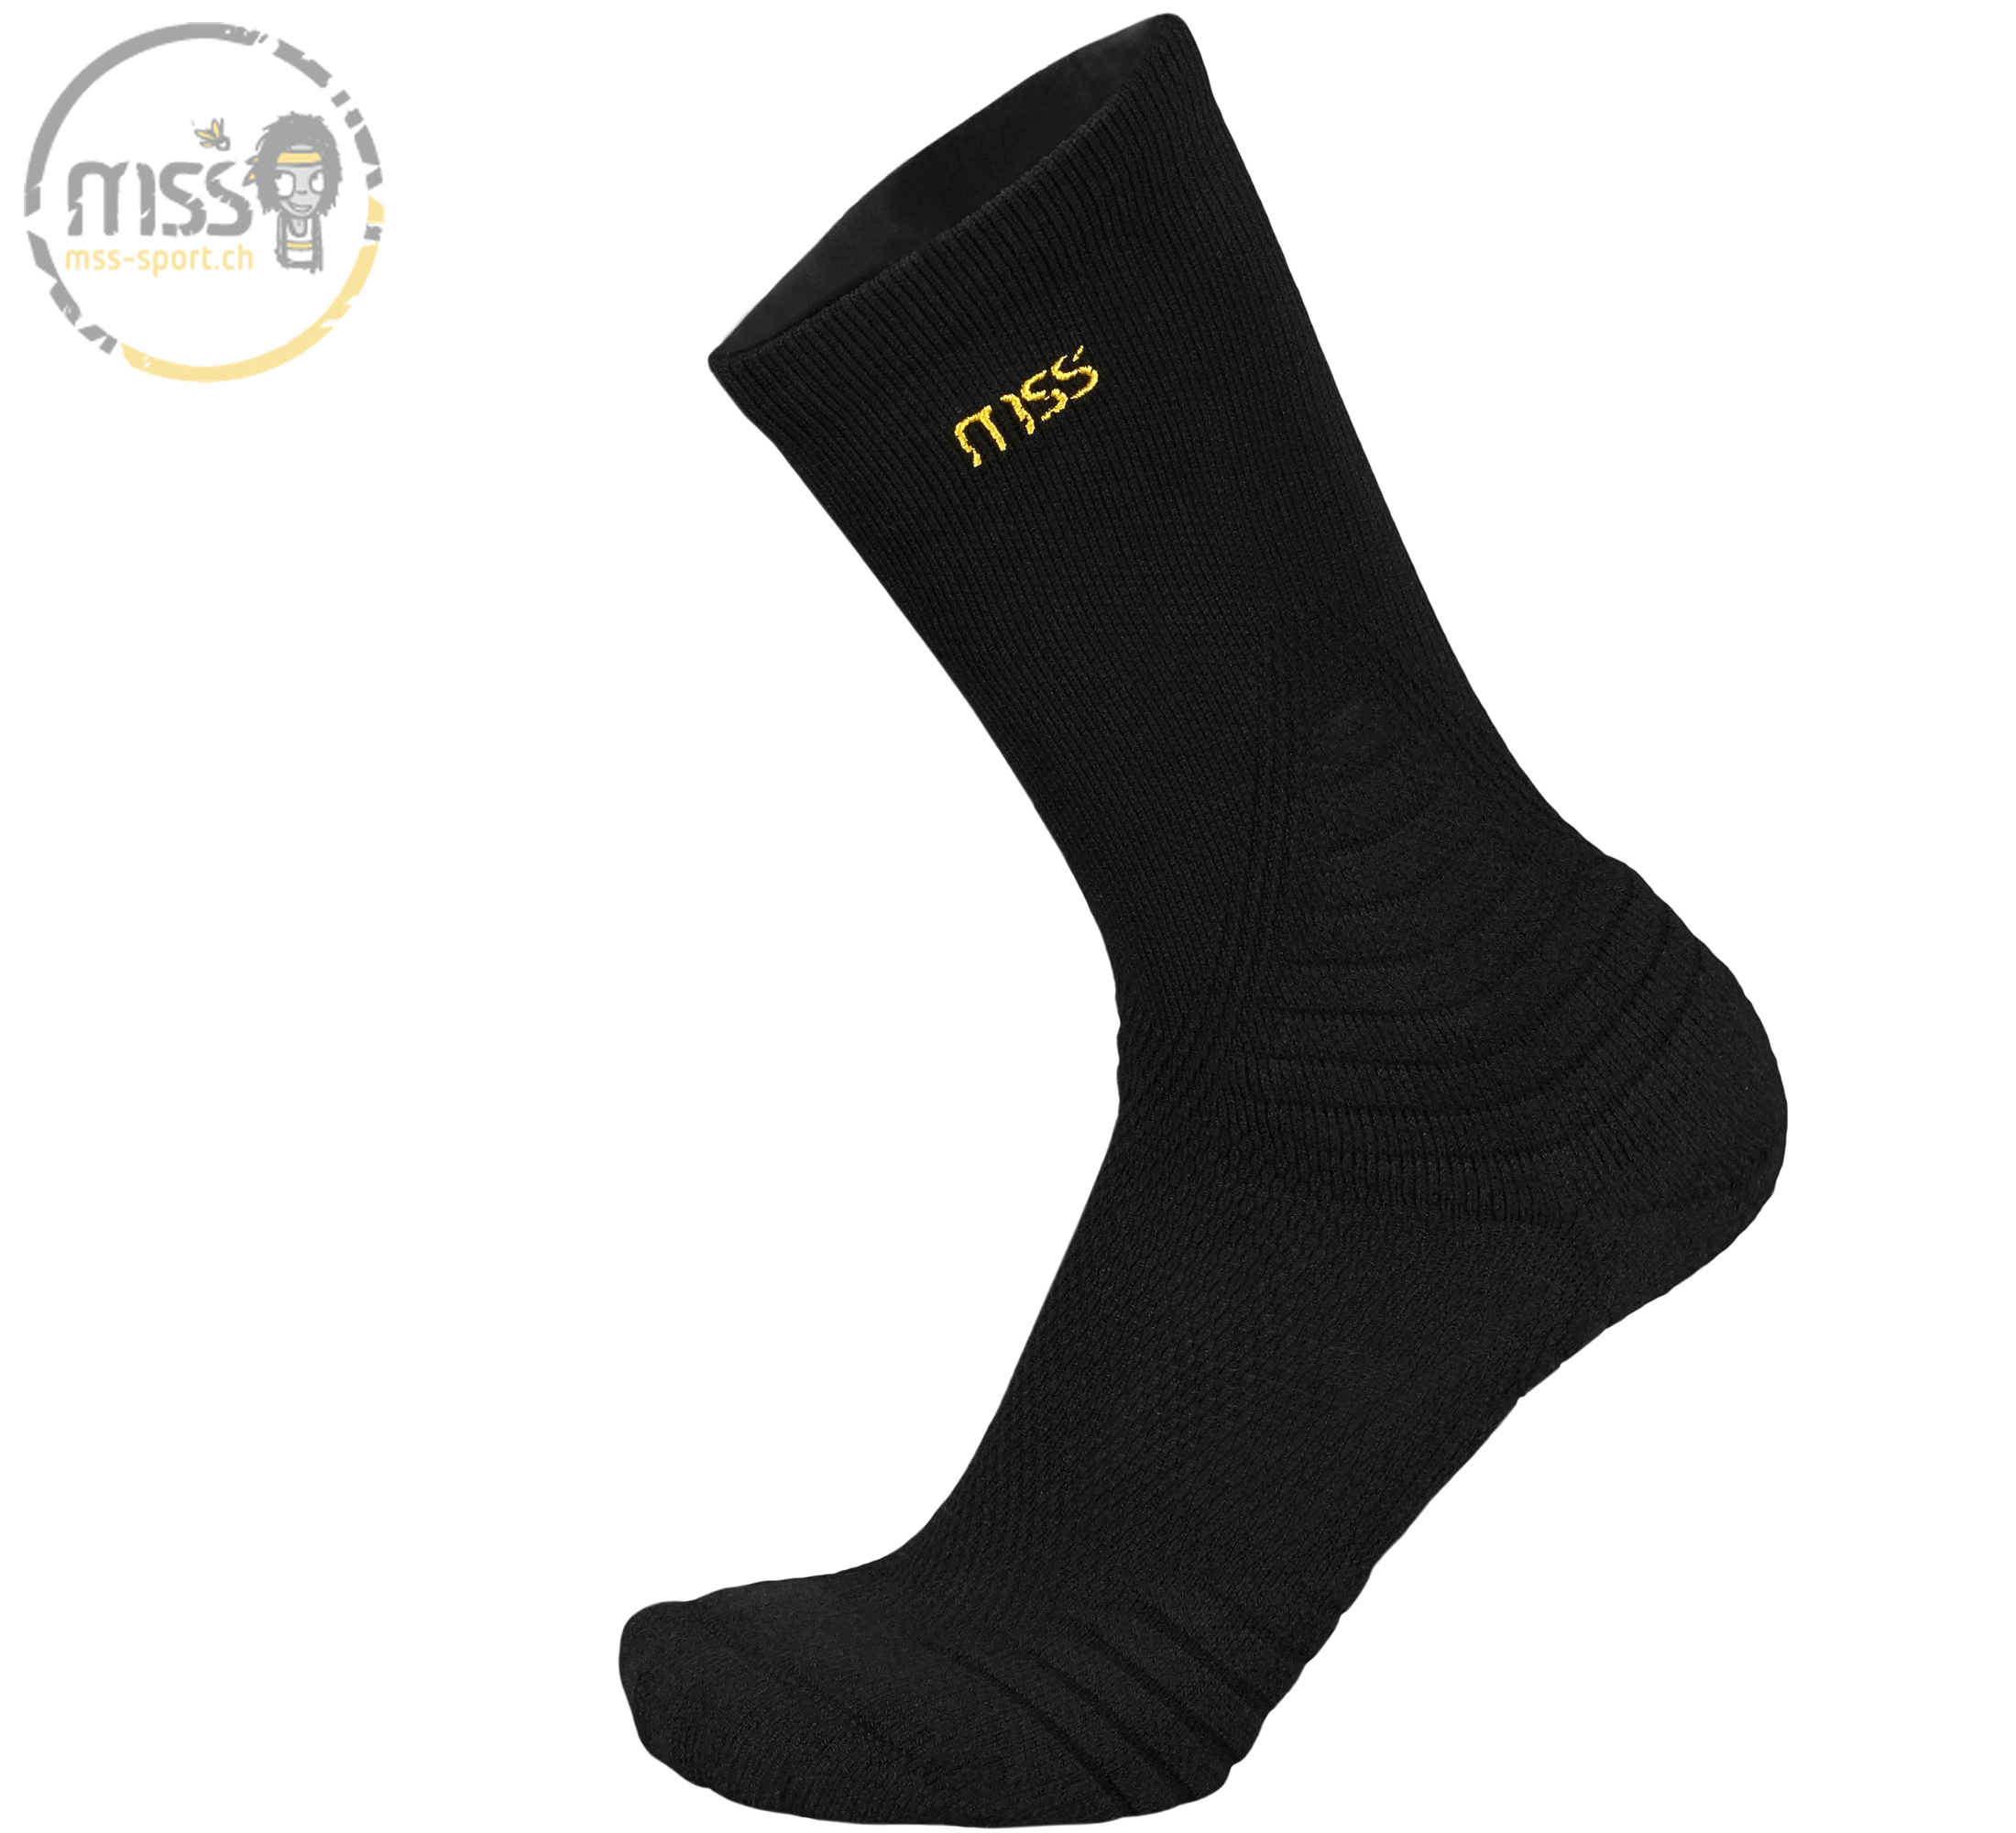 mss-socks Smash 5700 high black